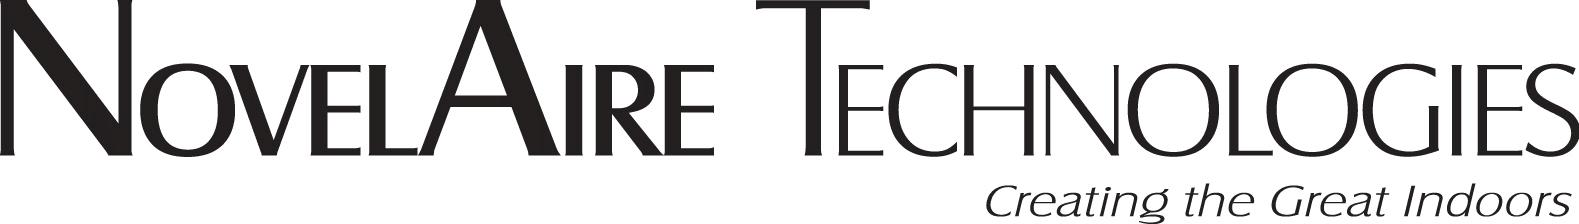 NovelAire Technologies